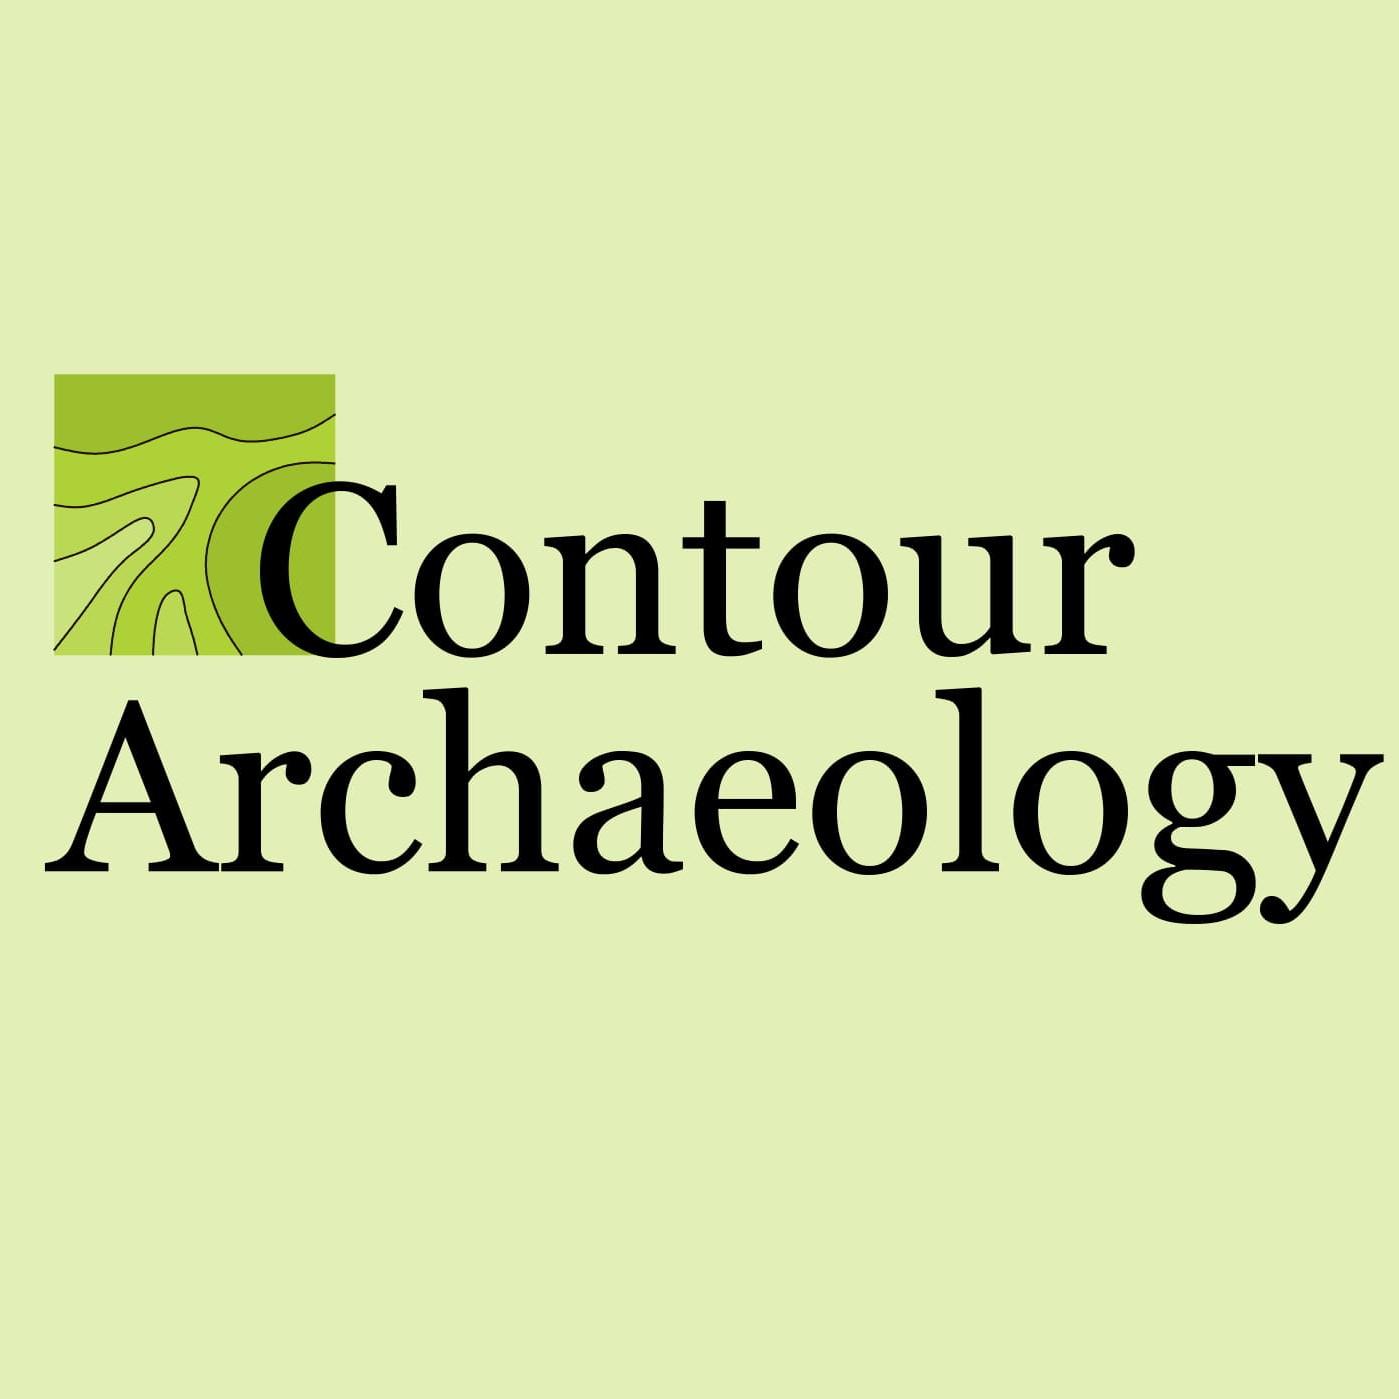 Contour Archaeology